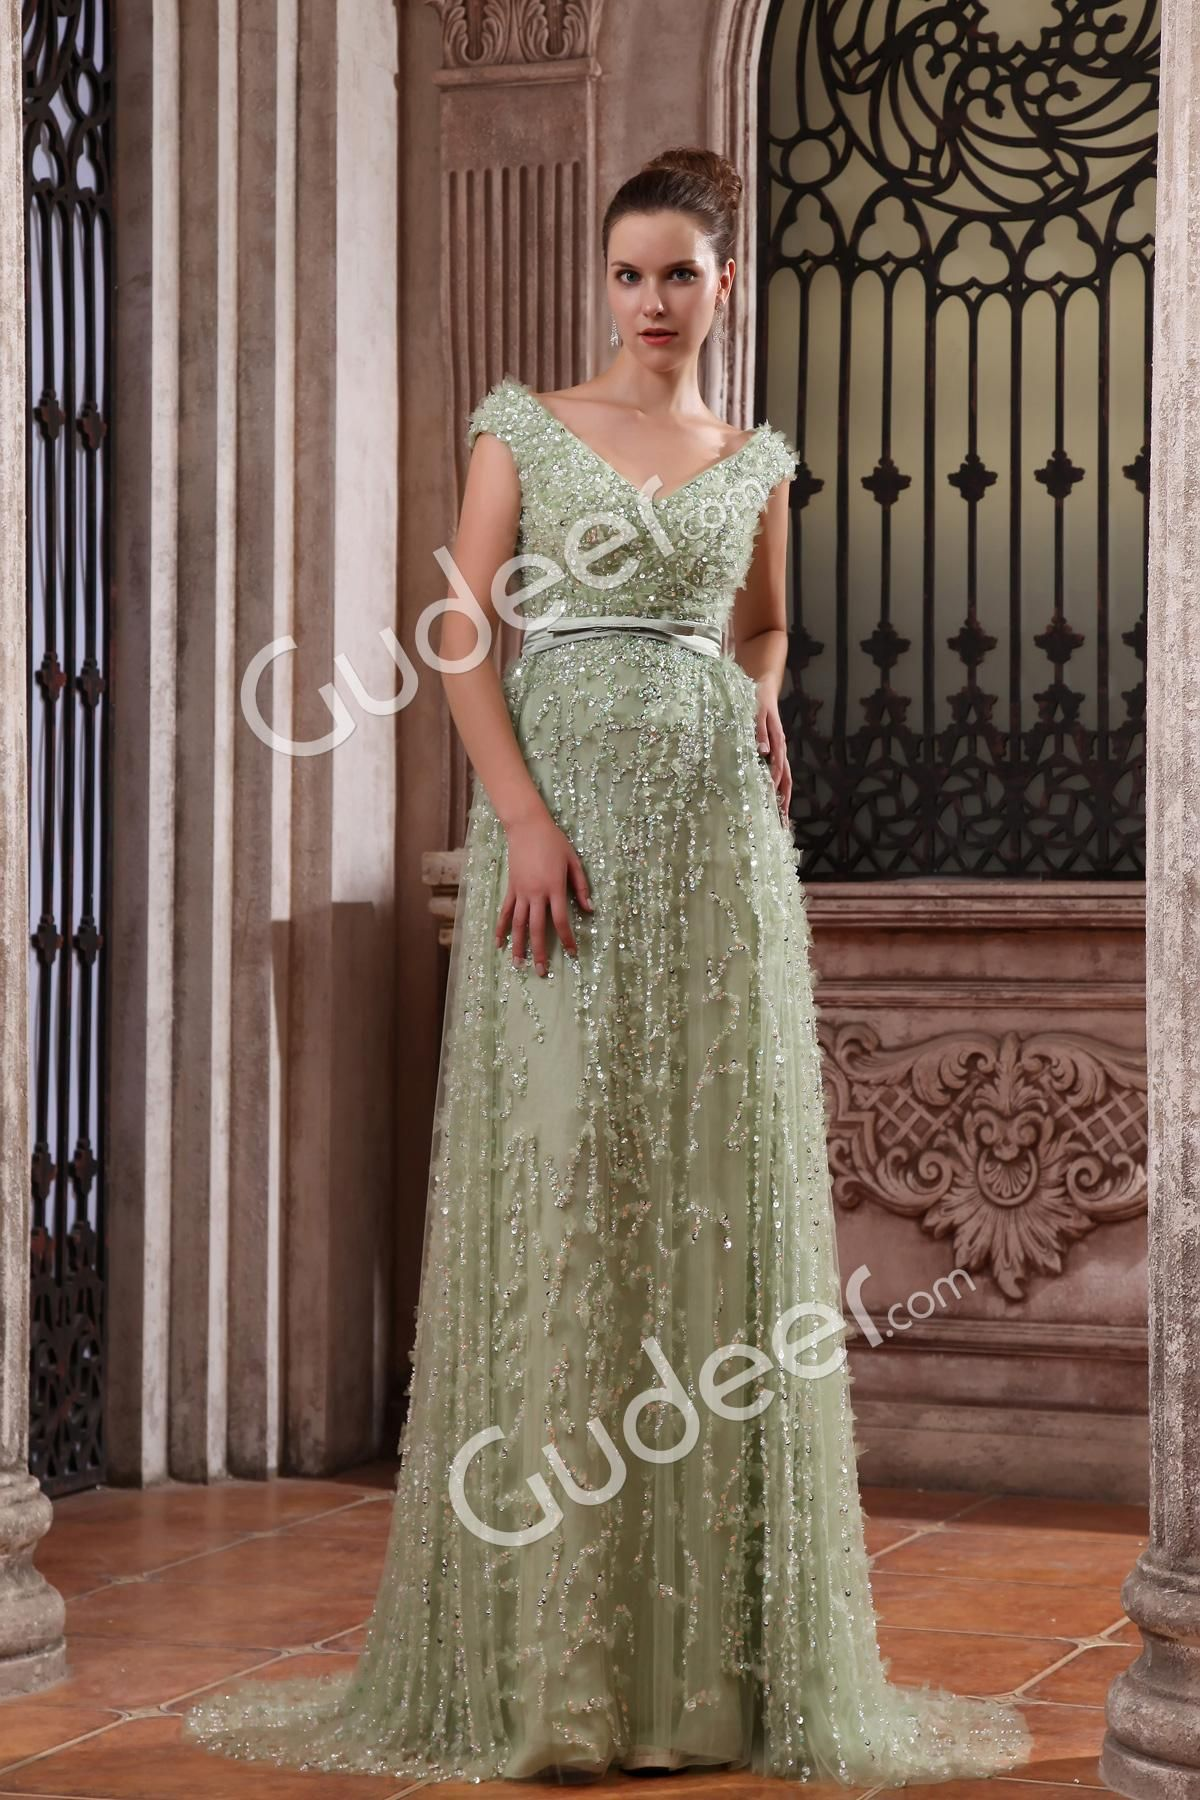 Sage luxury beaded chiffon sleeveless vneckline long evening gown